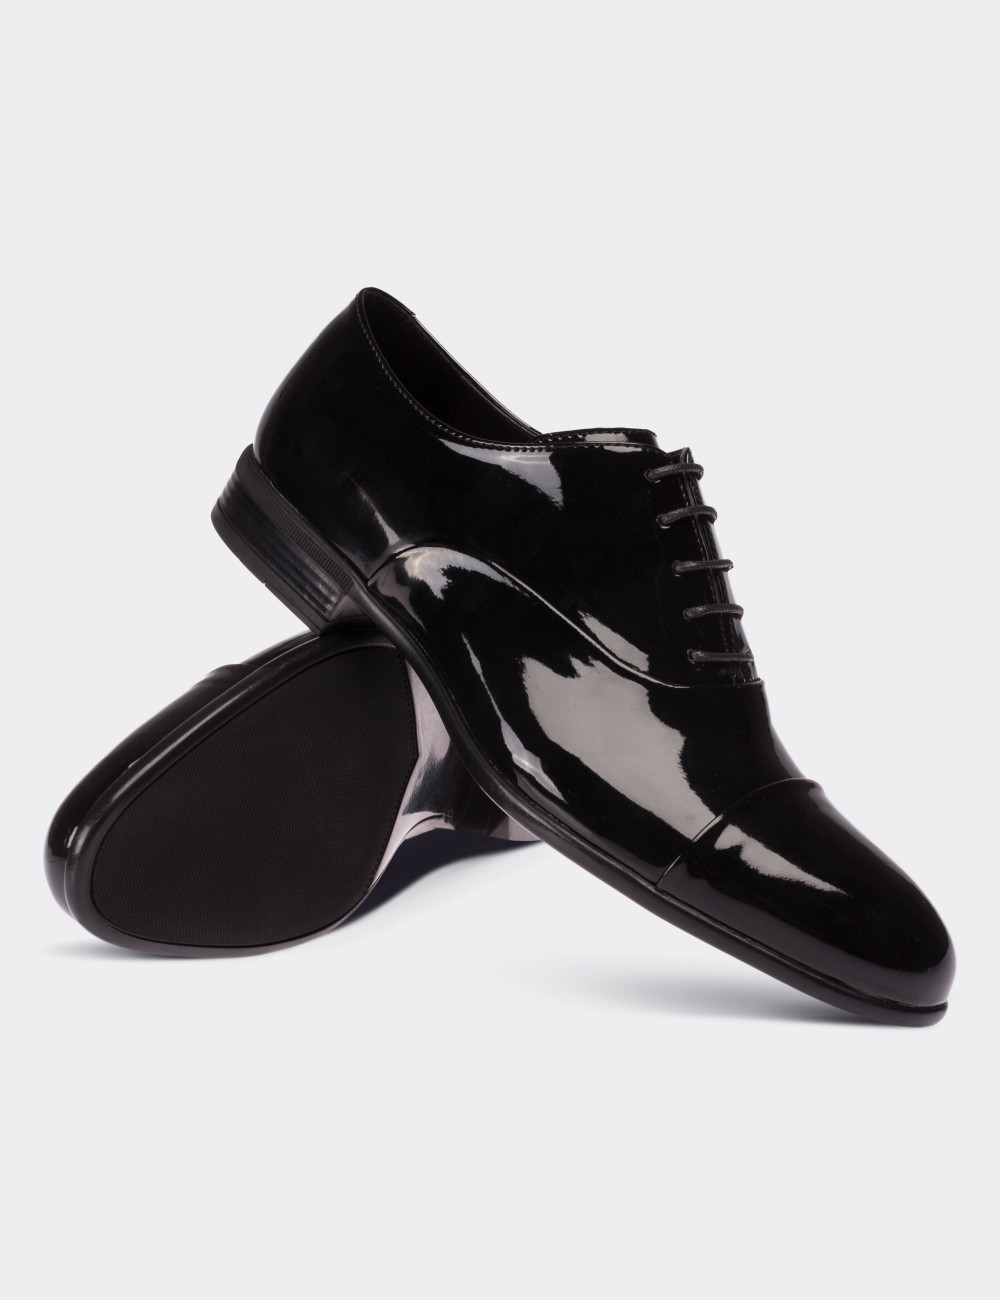 ef75742b1f80f Siyah Rugan Klasik Erkek Ayakkabı - 01026MSYHC01